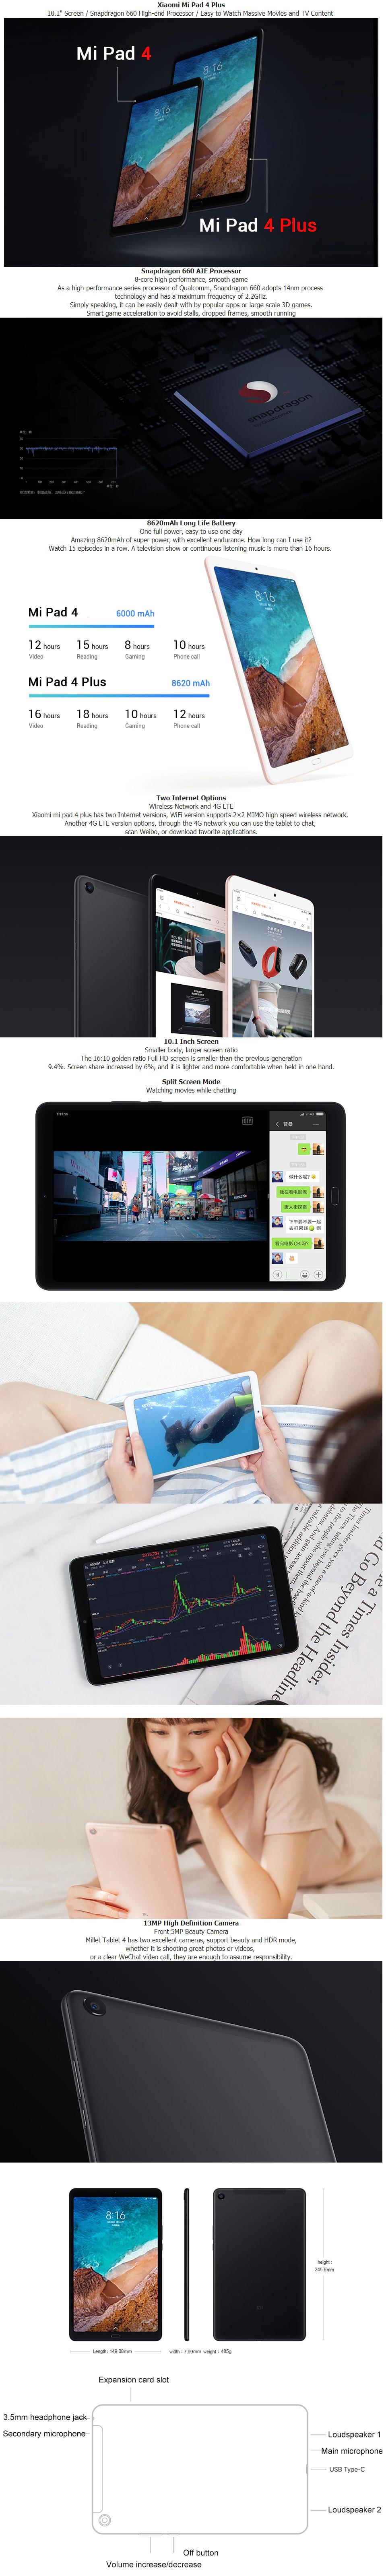 prezentare-mi-pad-4-plus-dualstore2481a33dbda0a6ce.png